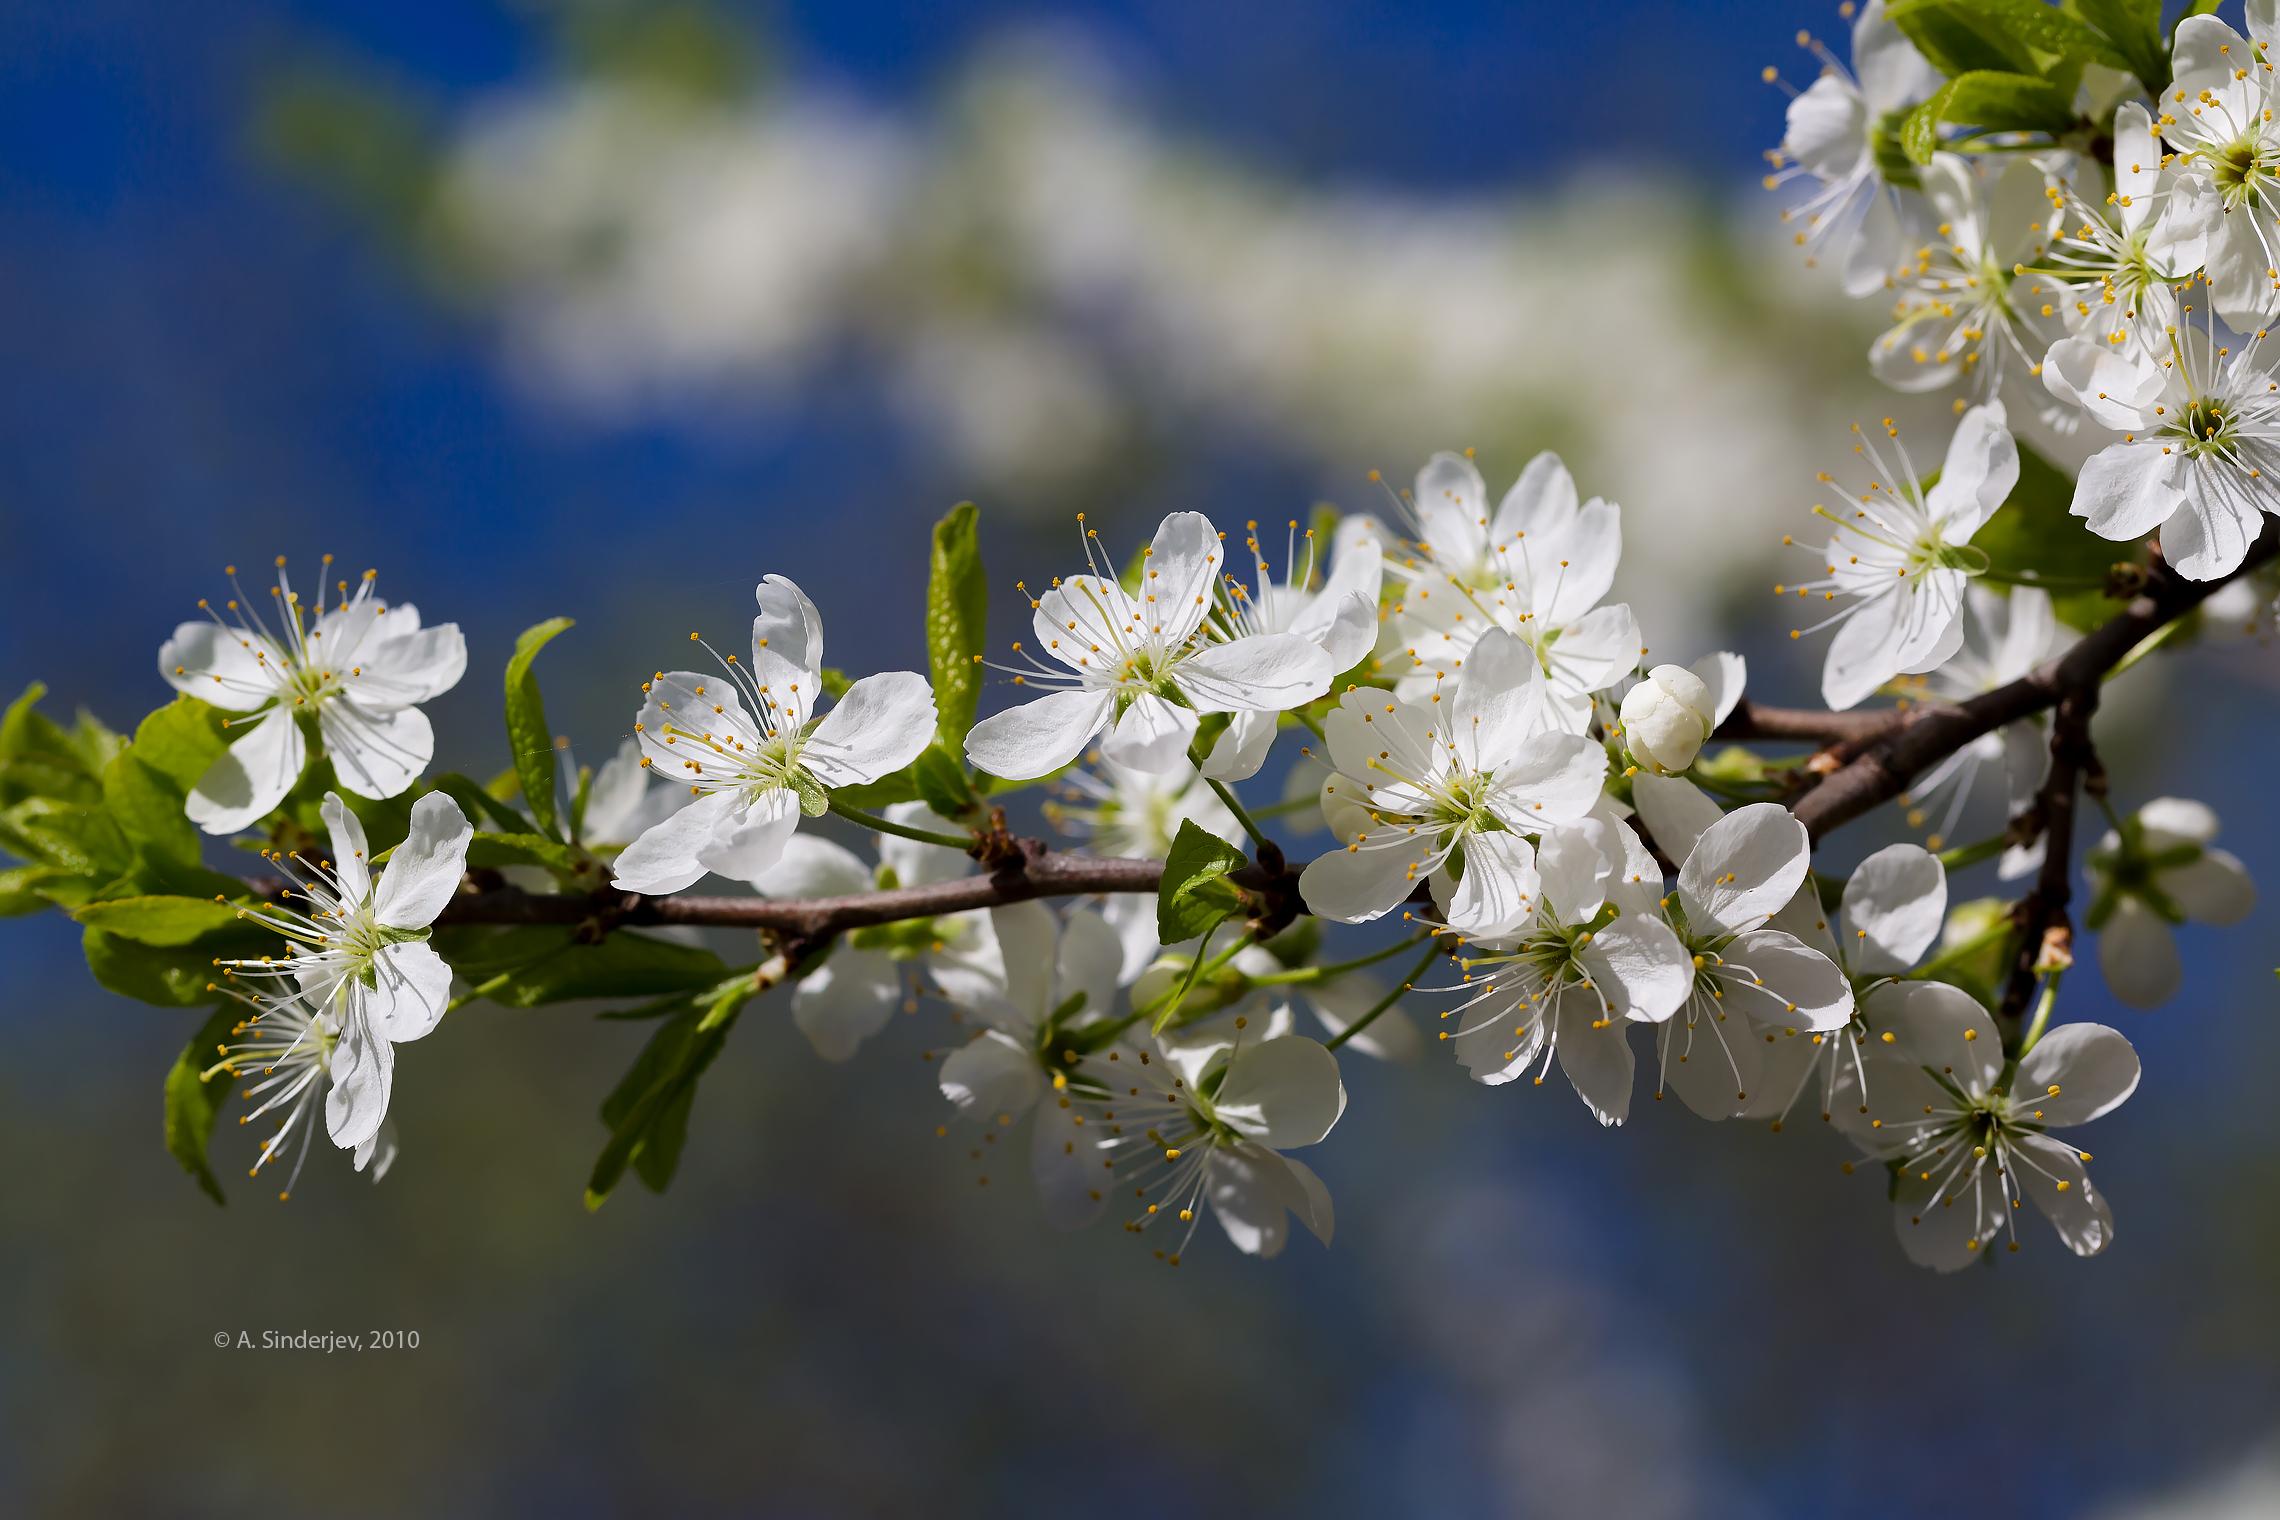 ветка цветущей вишни фото тогда